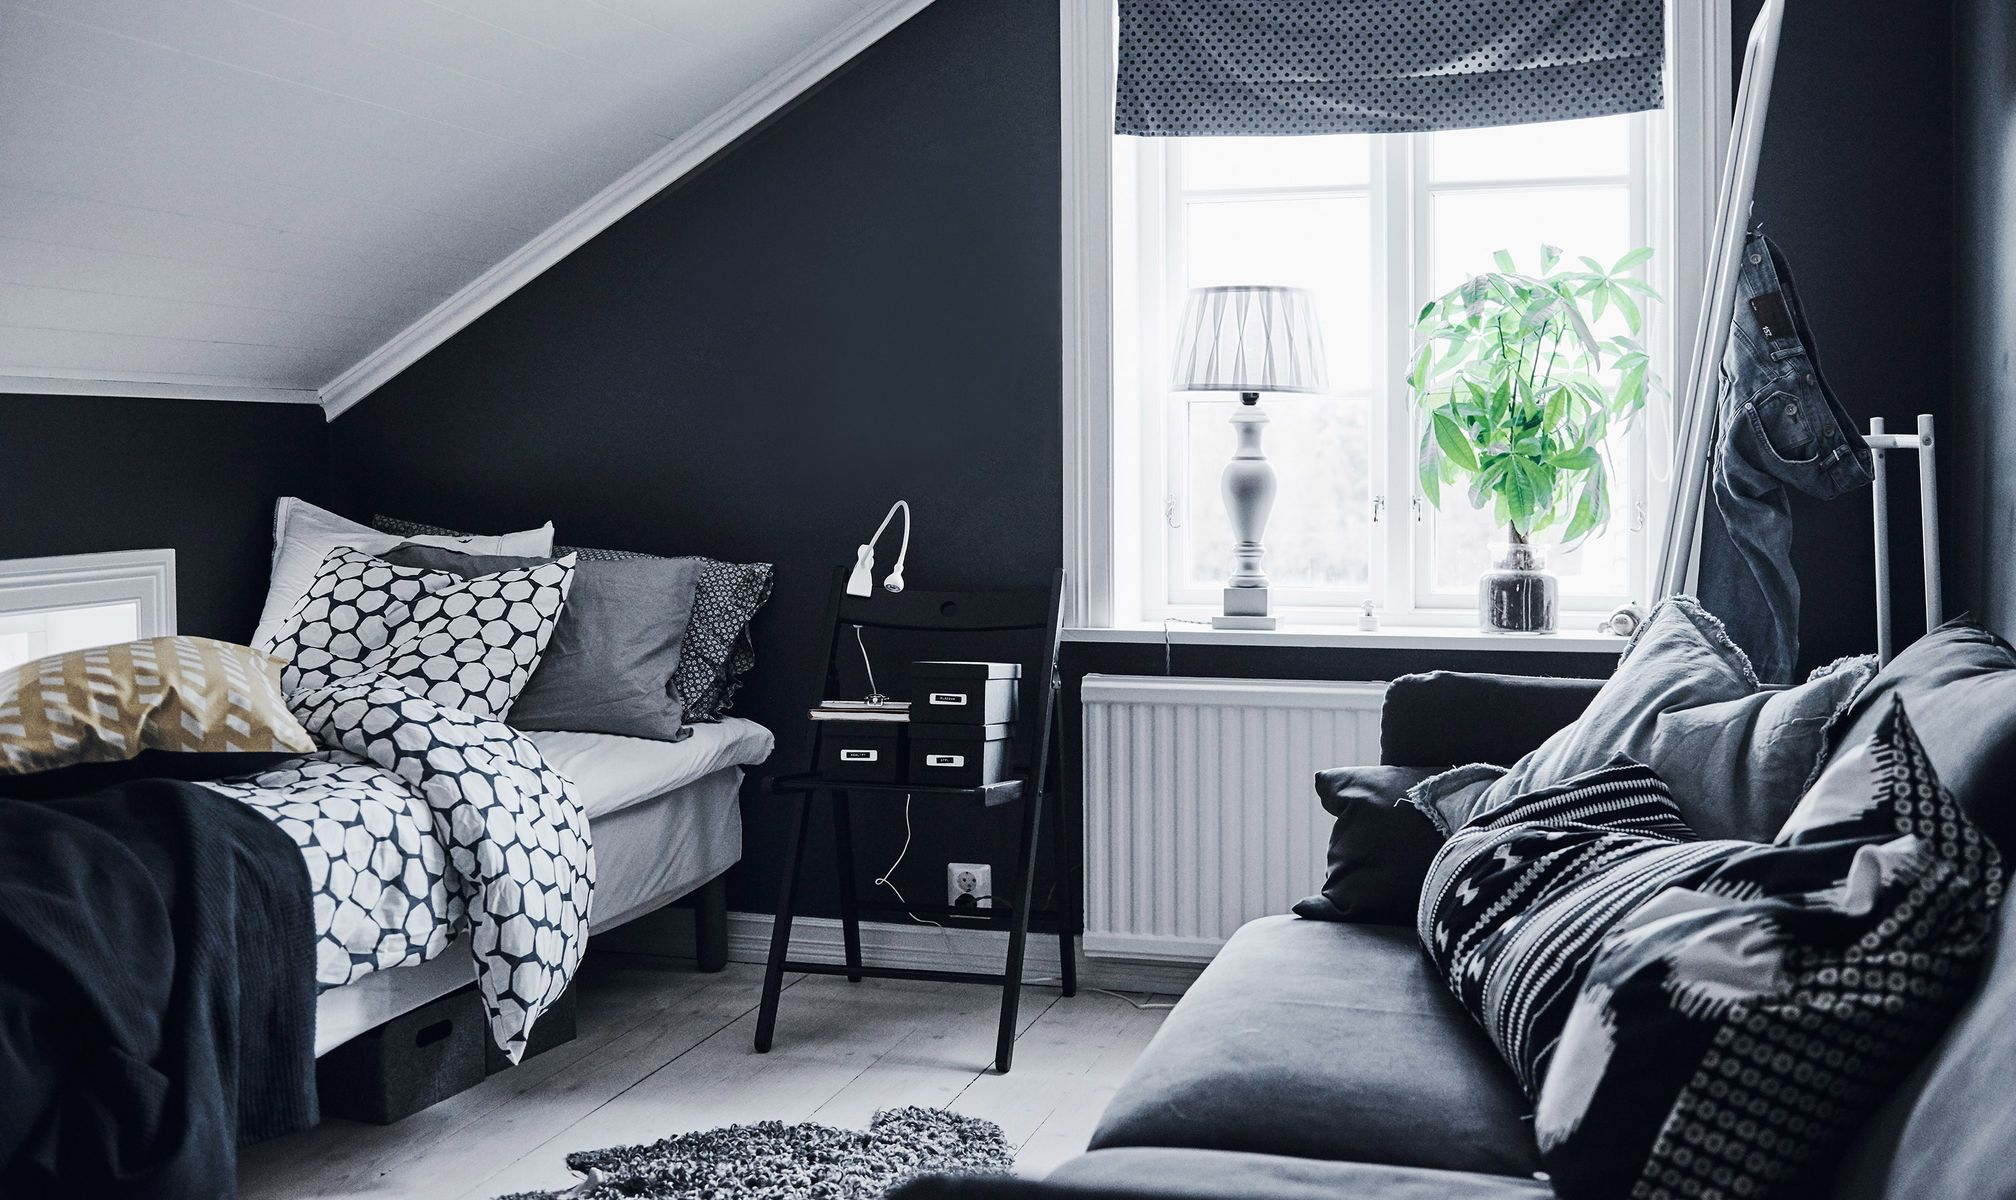 Ikea Family Magazine Spring 17 Inredning Dormitorios